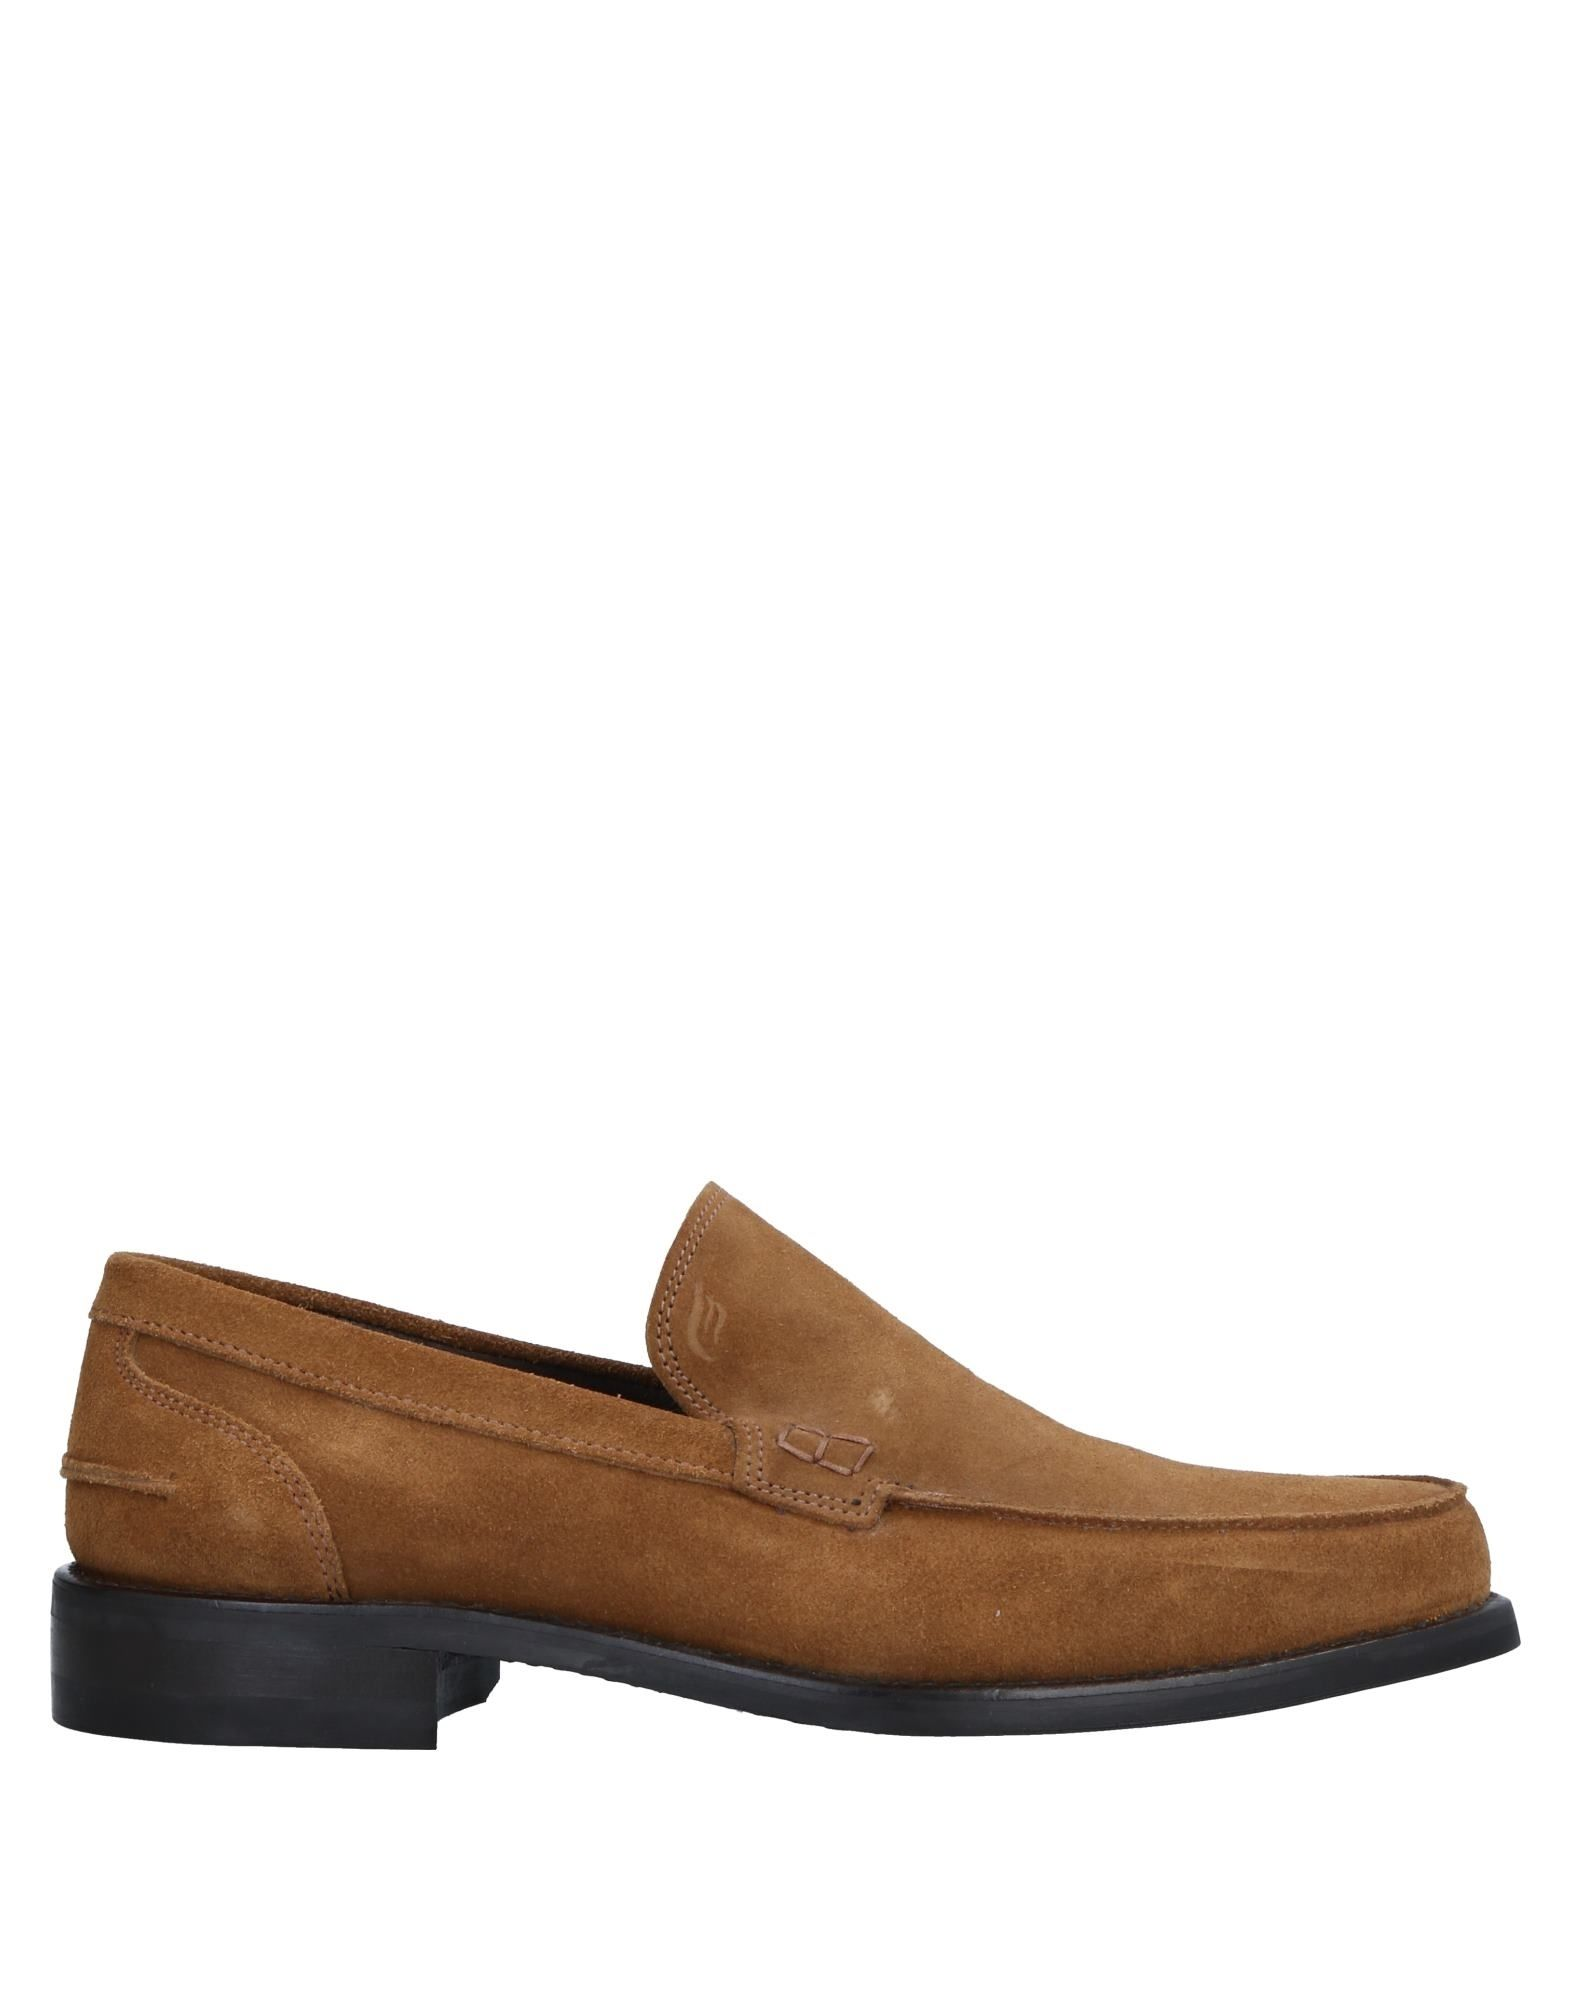 Rabatt echte Schuhe Angelo Nardelli Mokassins Herren  11544777MR